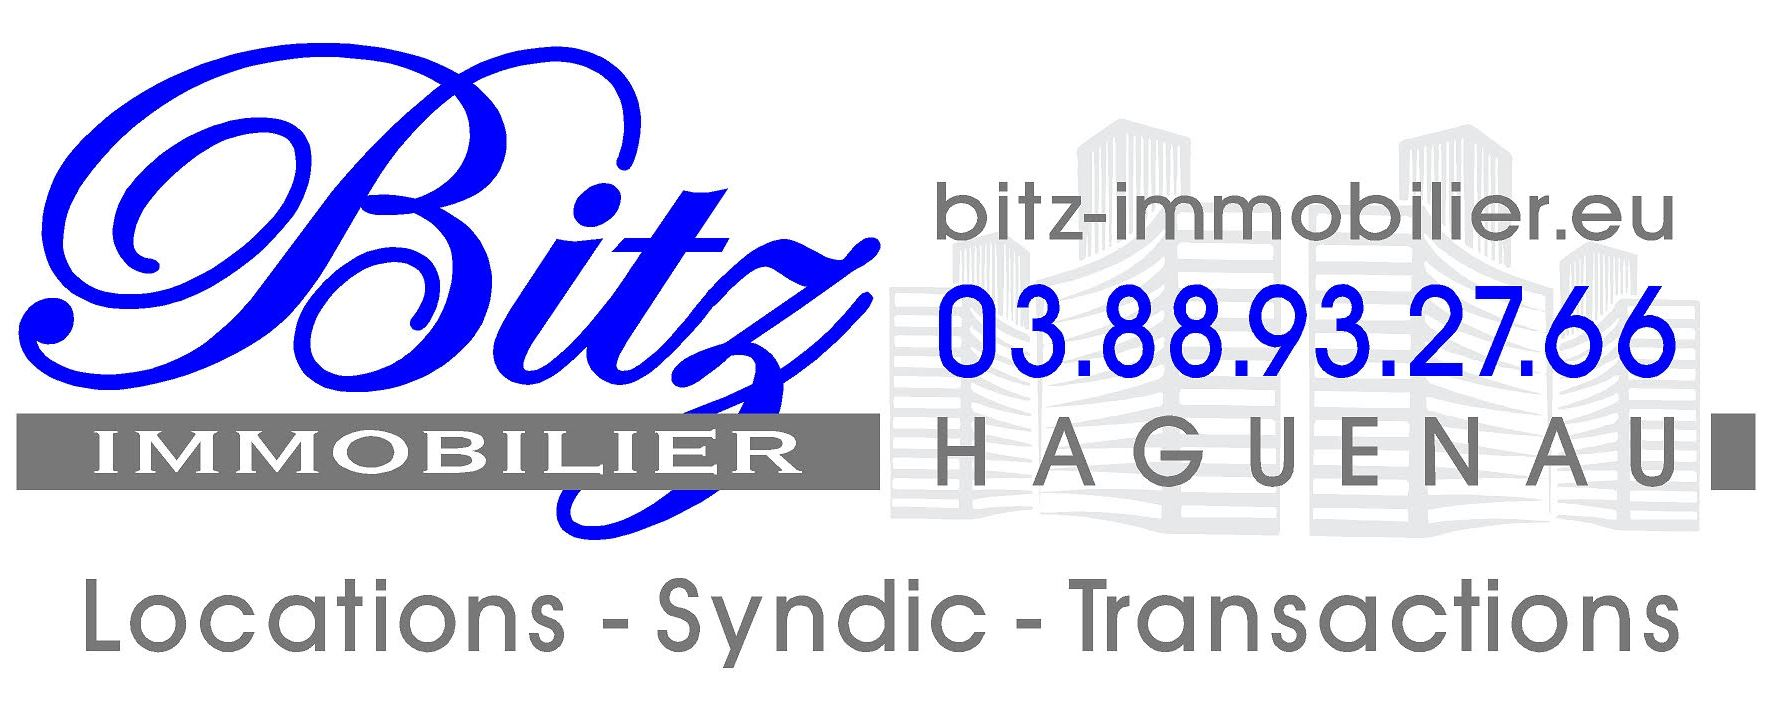 logo-bitz-immobilier